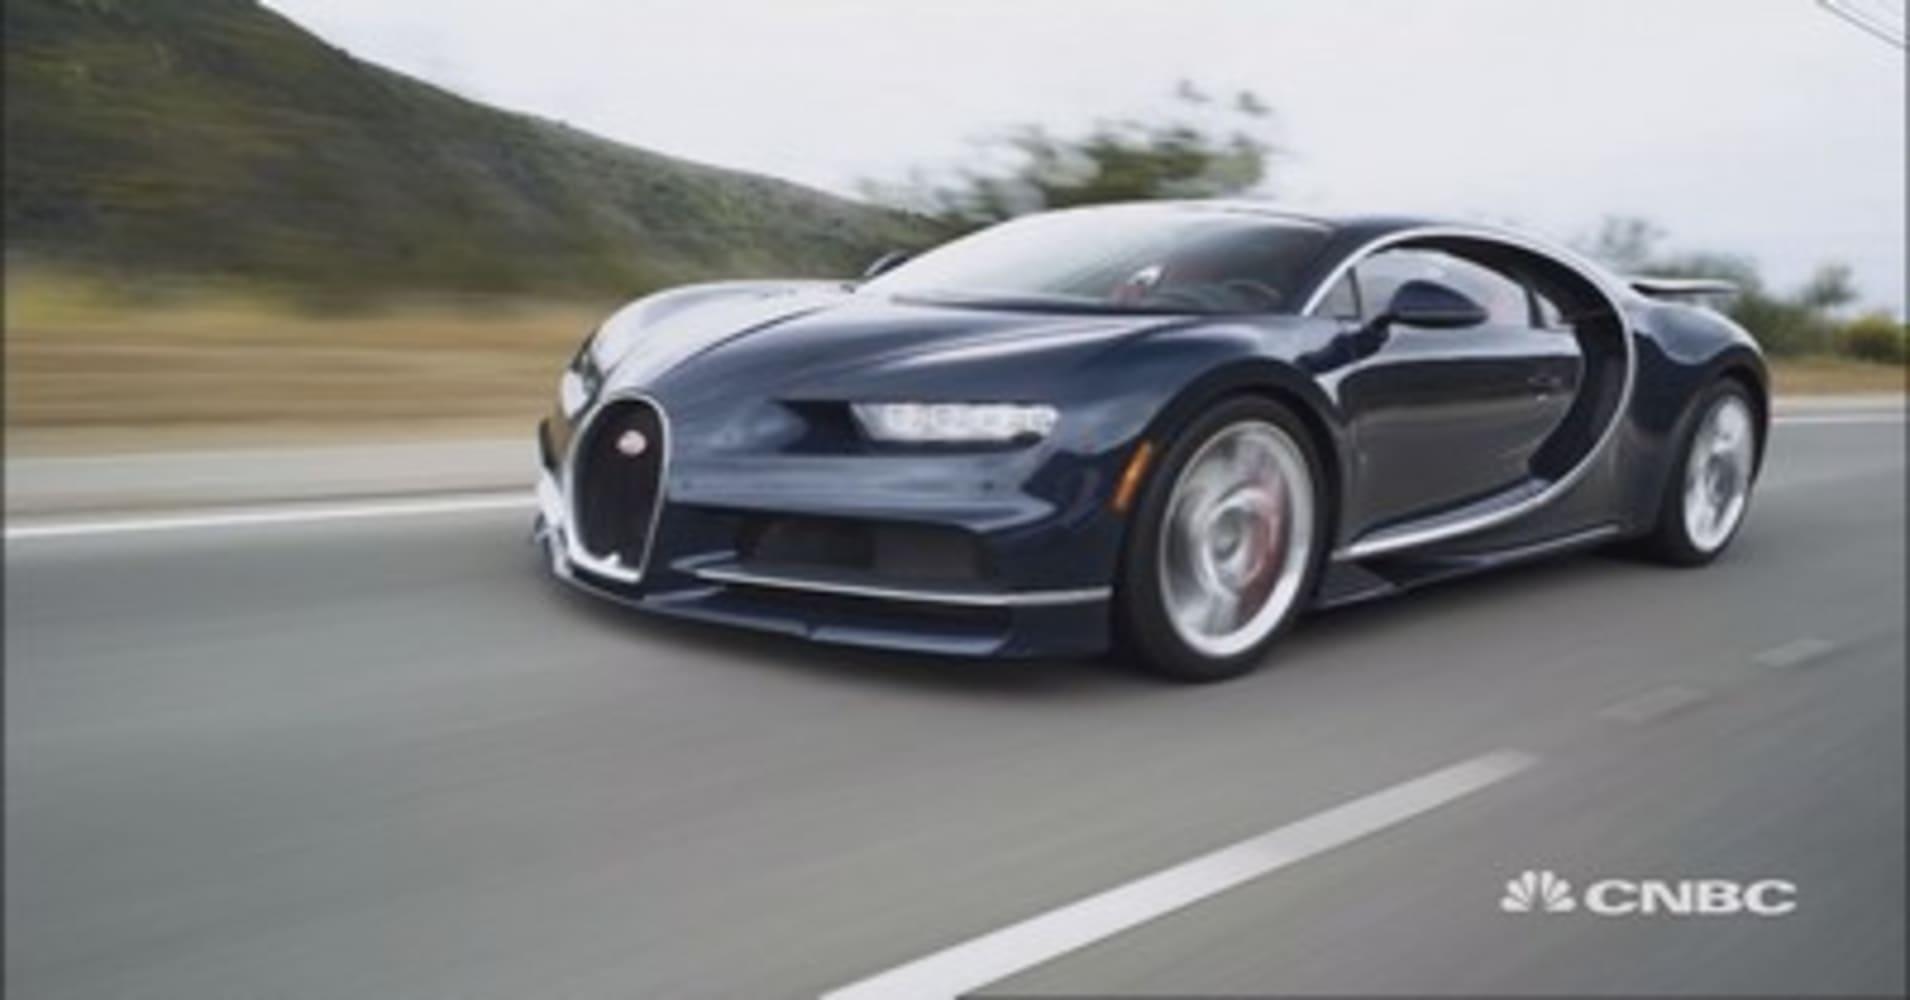 The Bugatti Chiron This Supercar Will Make You Wish You